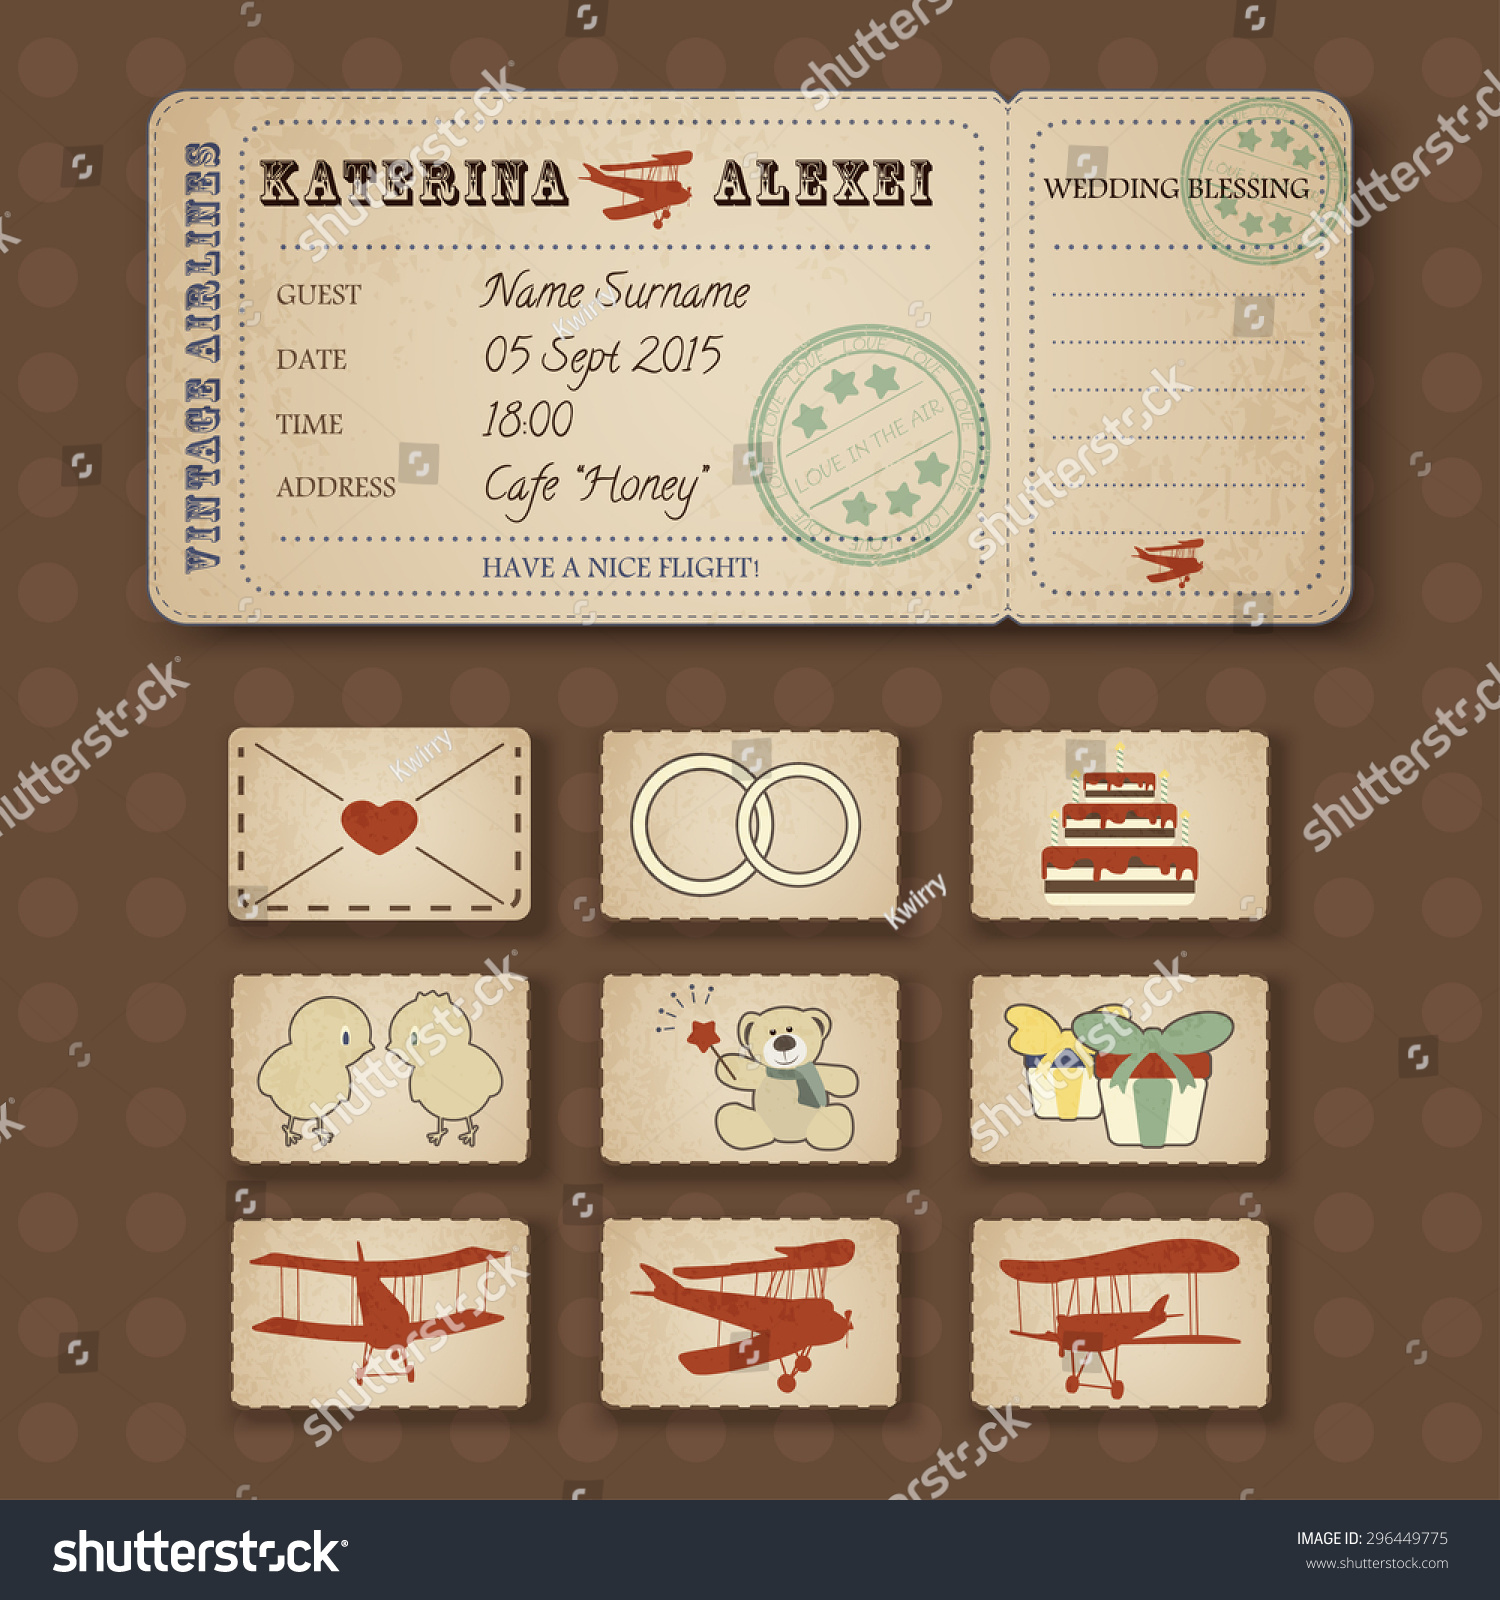 Plane Ticket Wedding Invitations – Airline Ticket Birthday Invitations